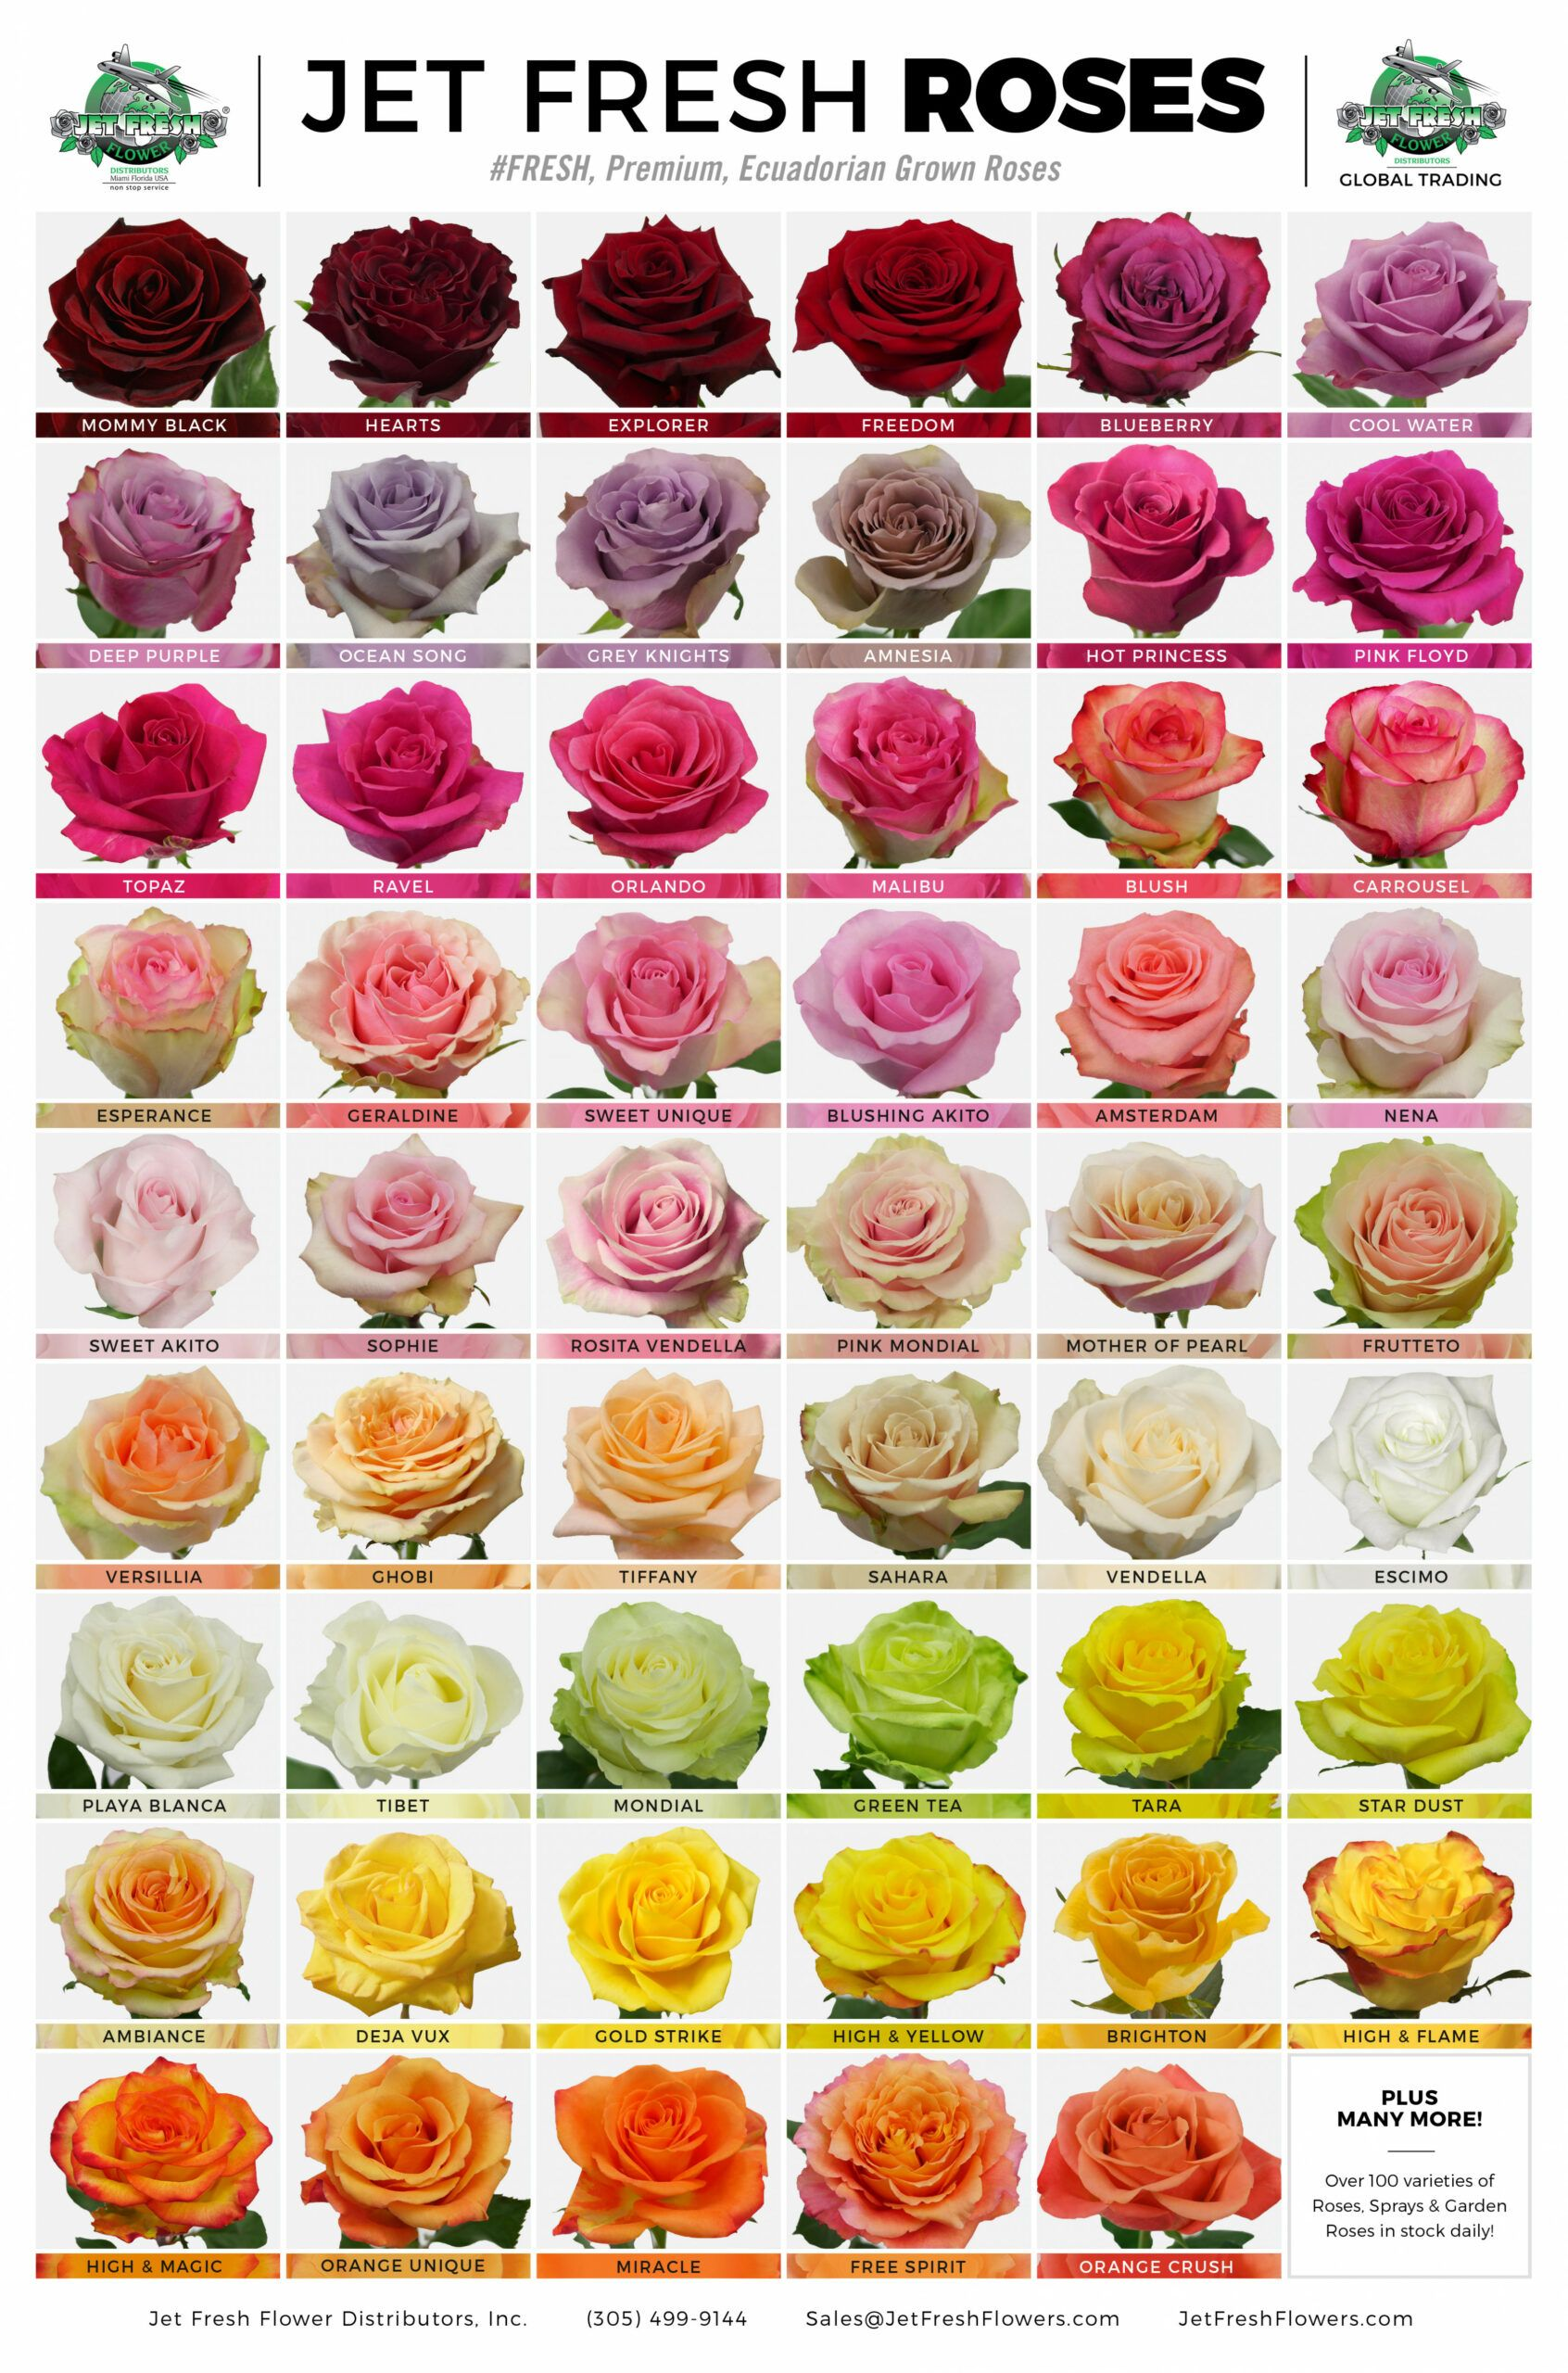 Ten Solid Evidences Attending Types Of Flowers Rose Is Good For Your Career Development Types Of Flowe Rose Varieties Beautiful Rose Flowers Types Of Flowers